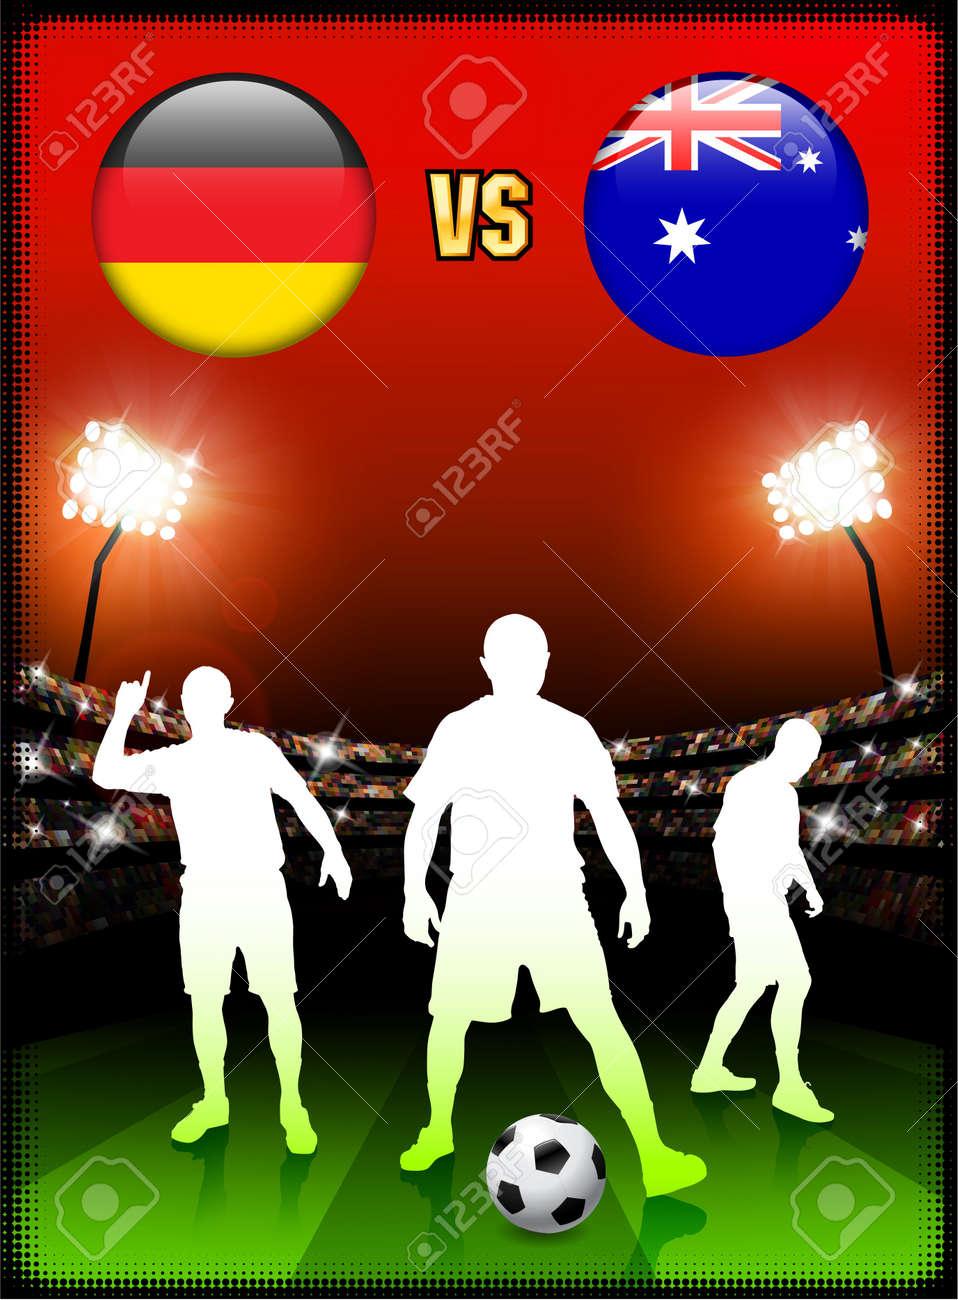 Germany versus Australia on Stadium Event BackgroundOriginal Illustration Stock Illustration - 7138062